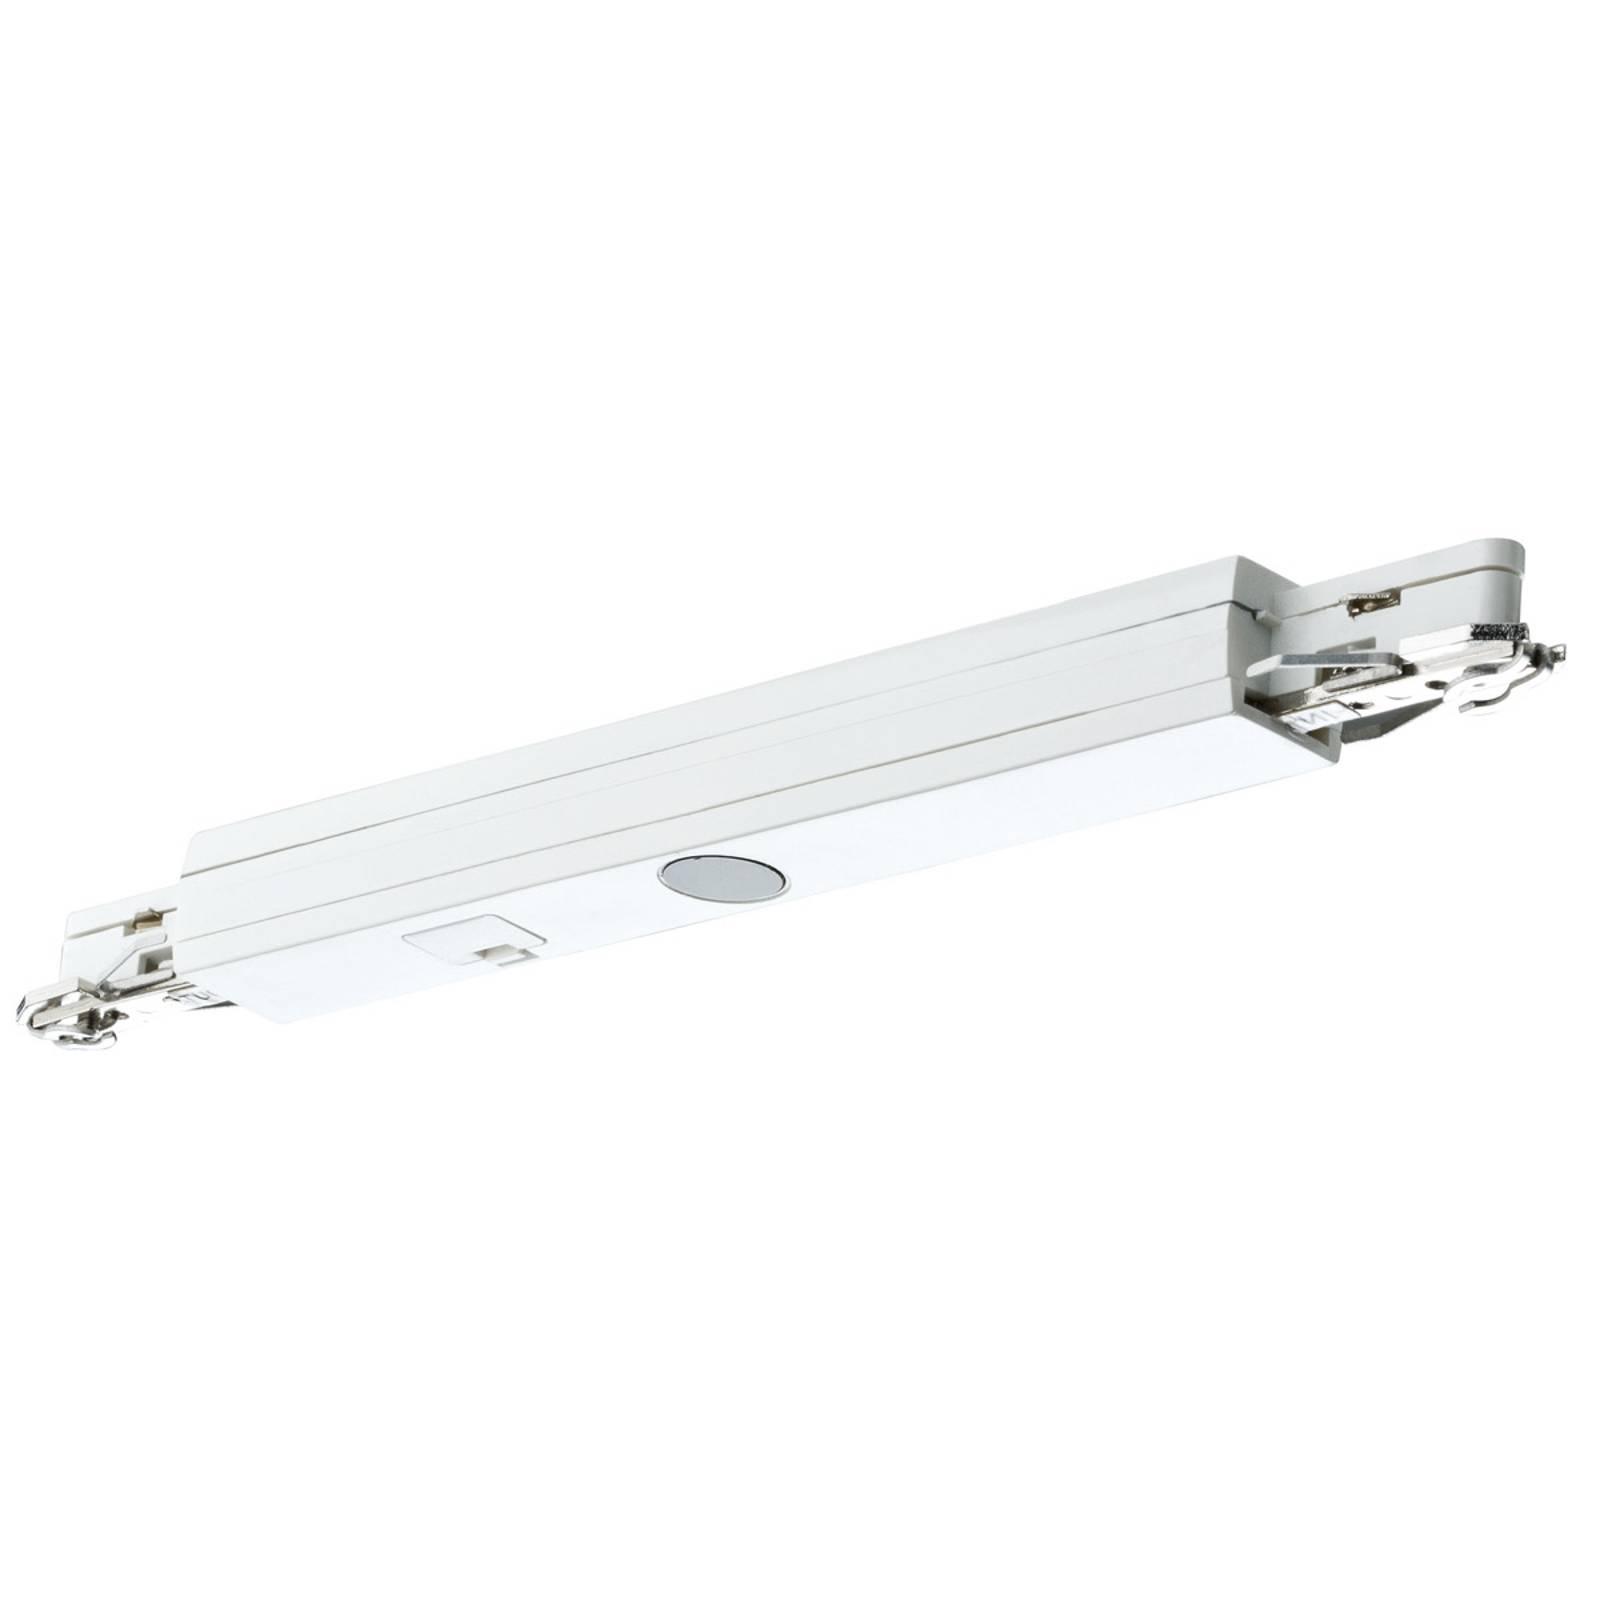 Paulmann URail Dimm/Switch II raccordo bianco